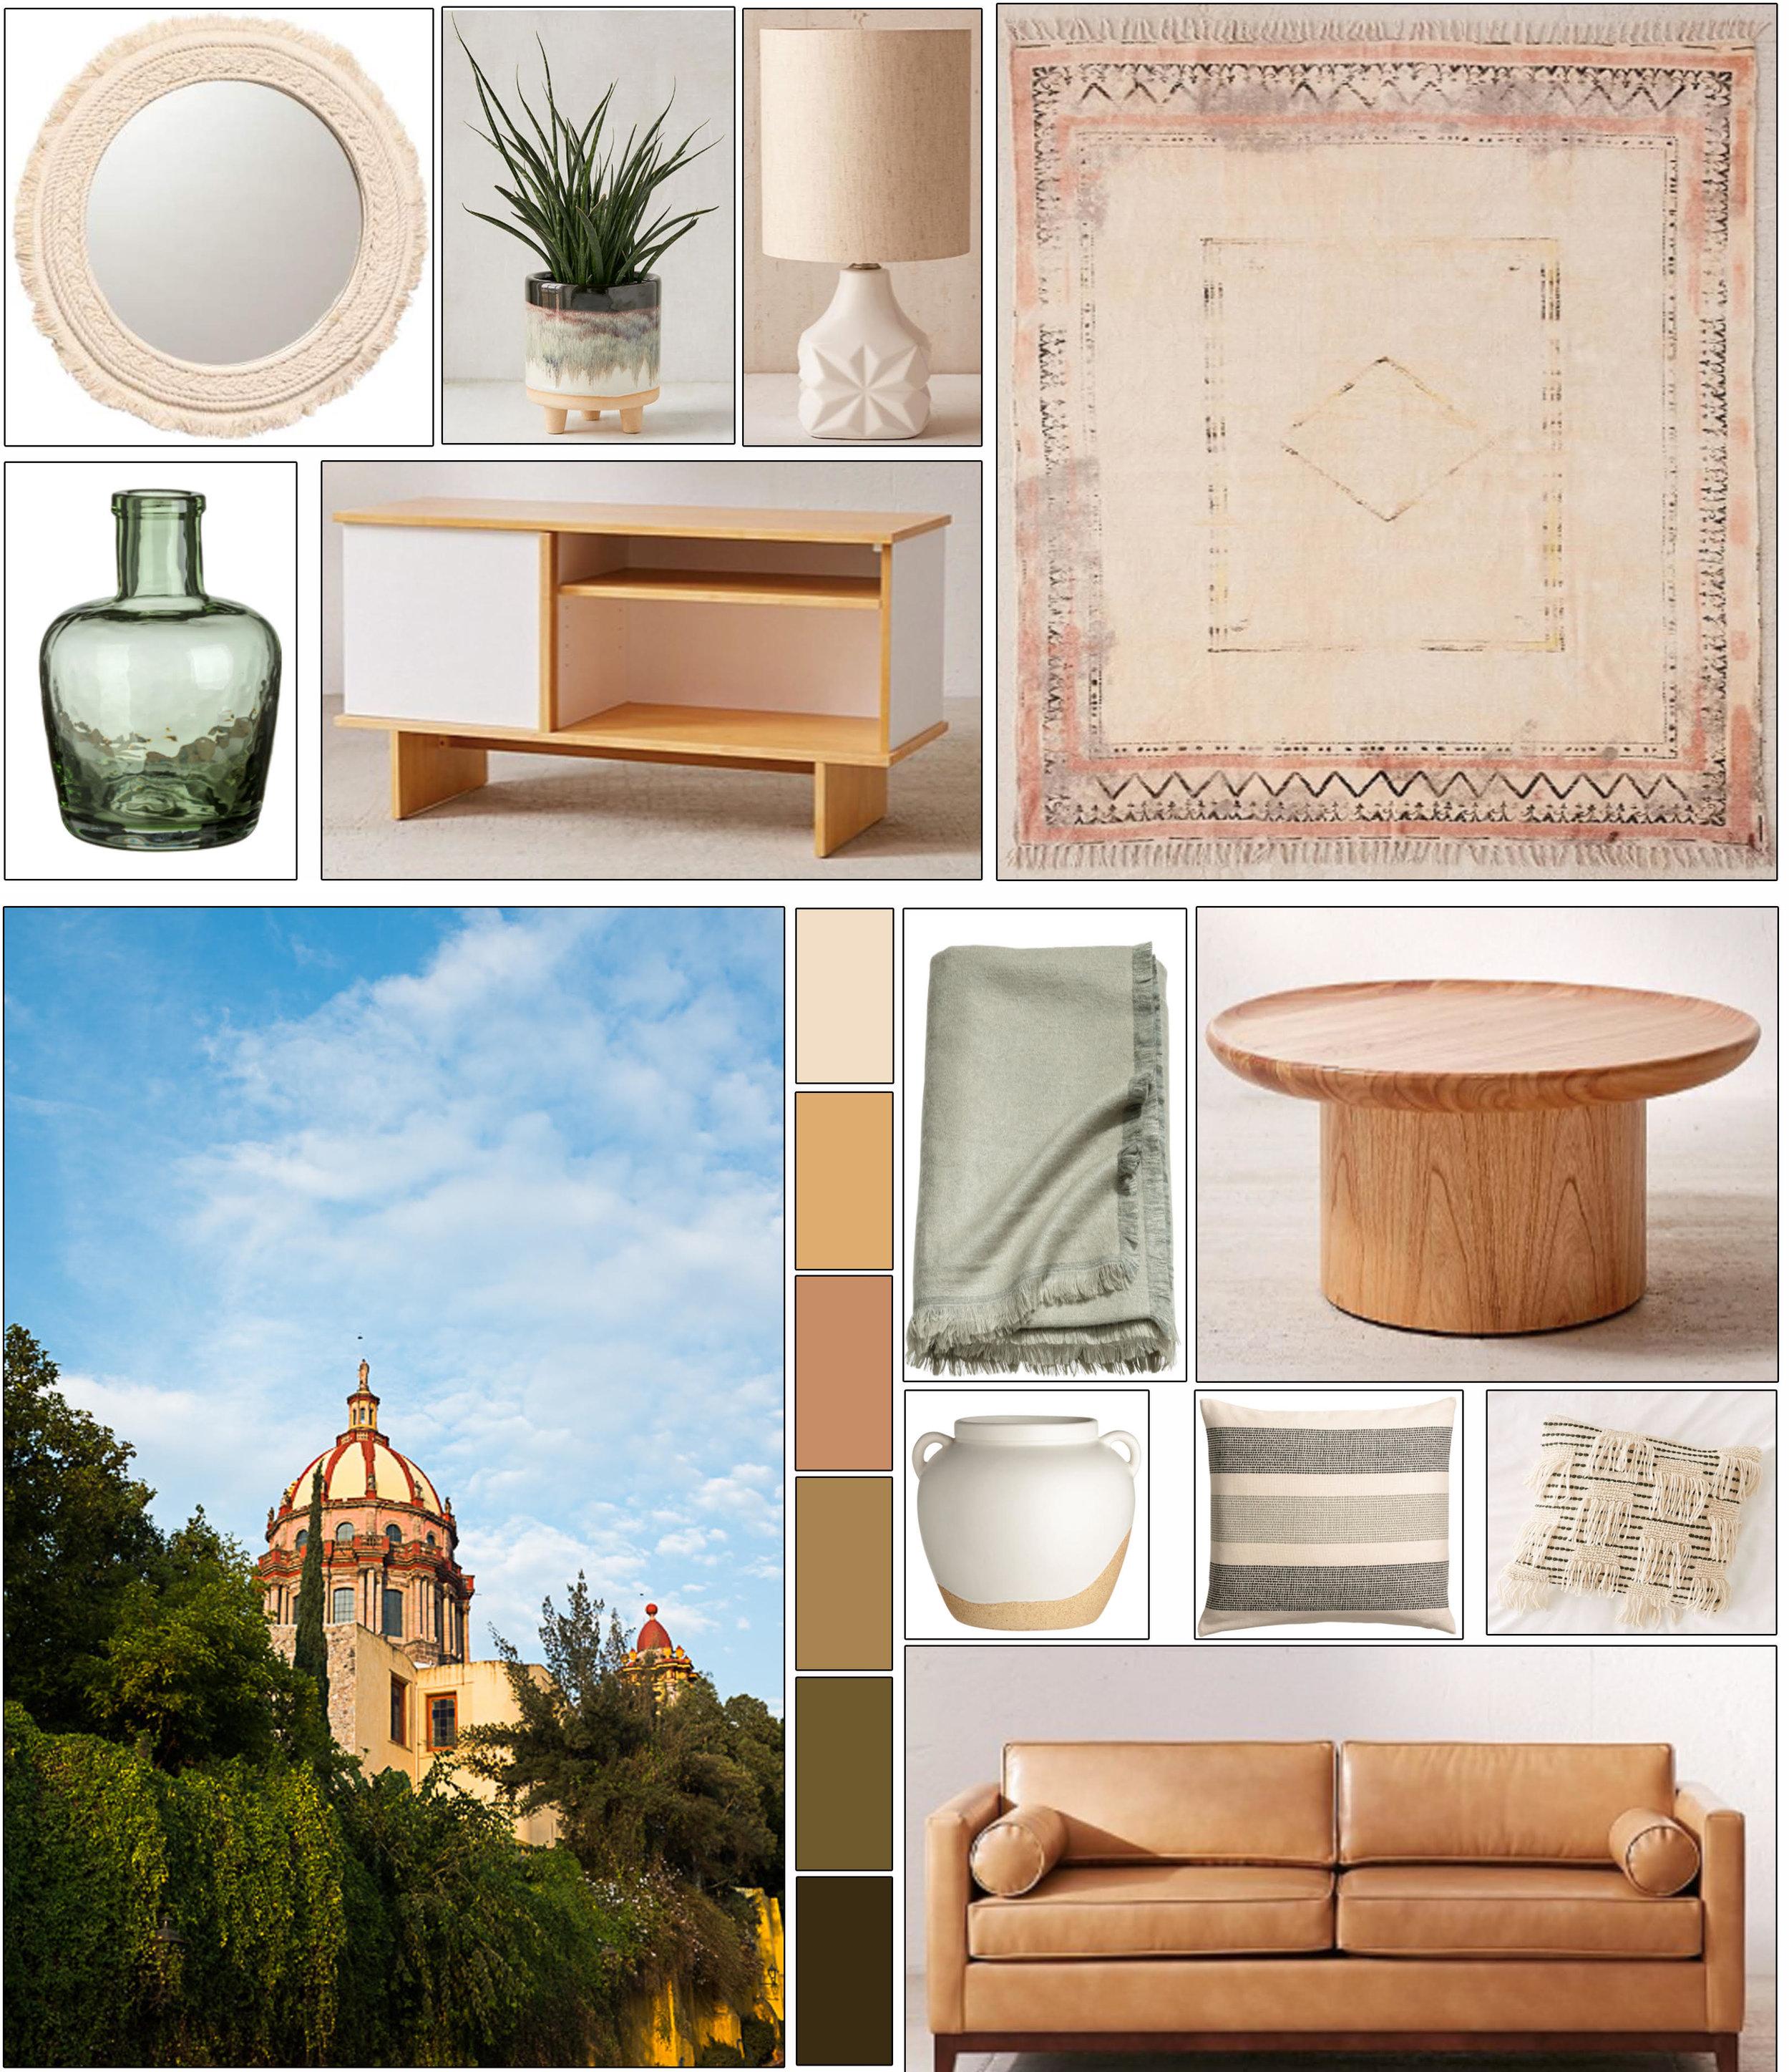 mexico-church-print-moodboard-home-art-decor-karinamoraprints-2.jpg